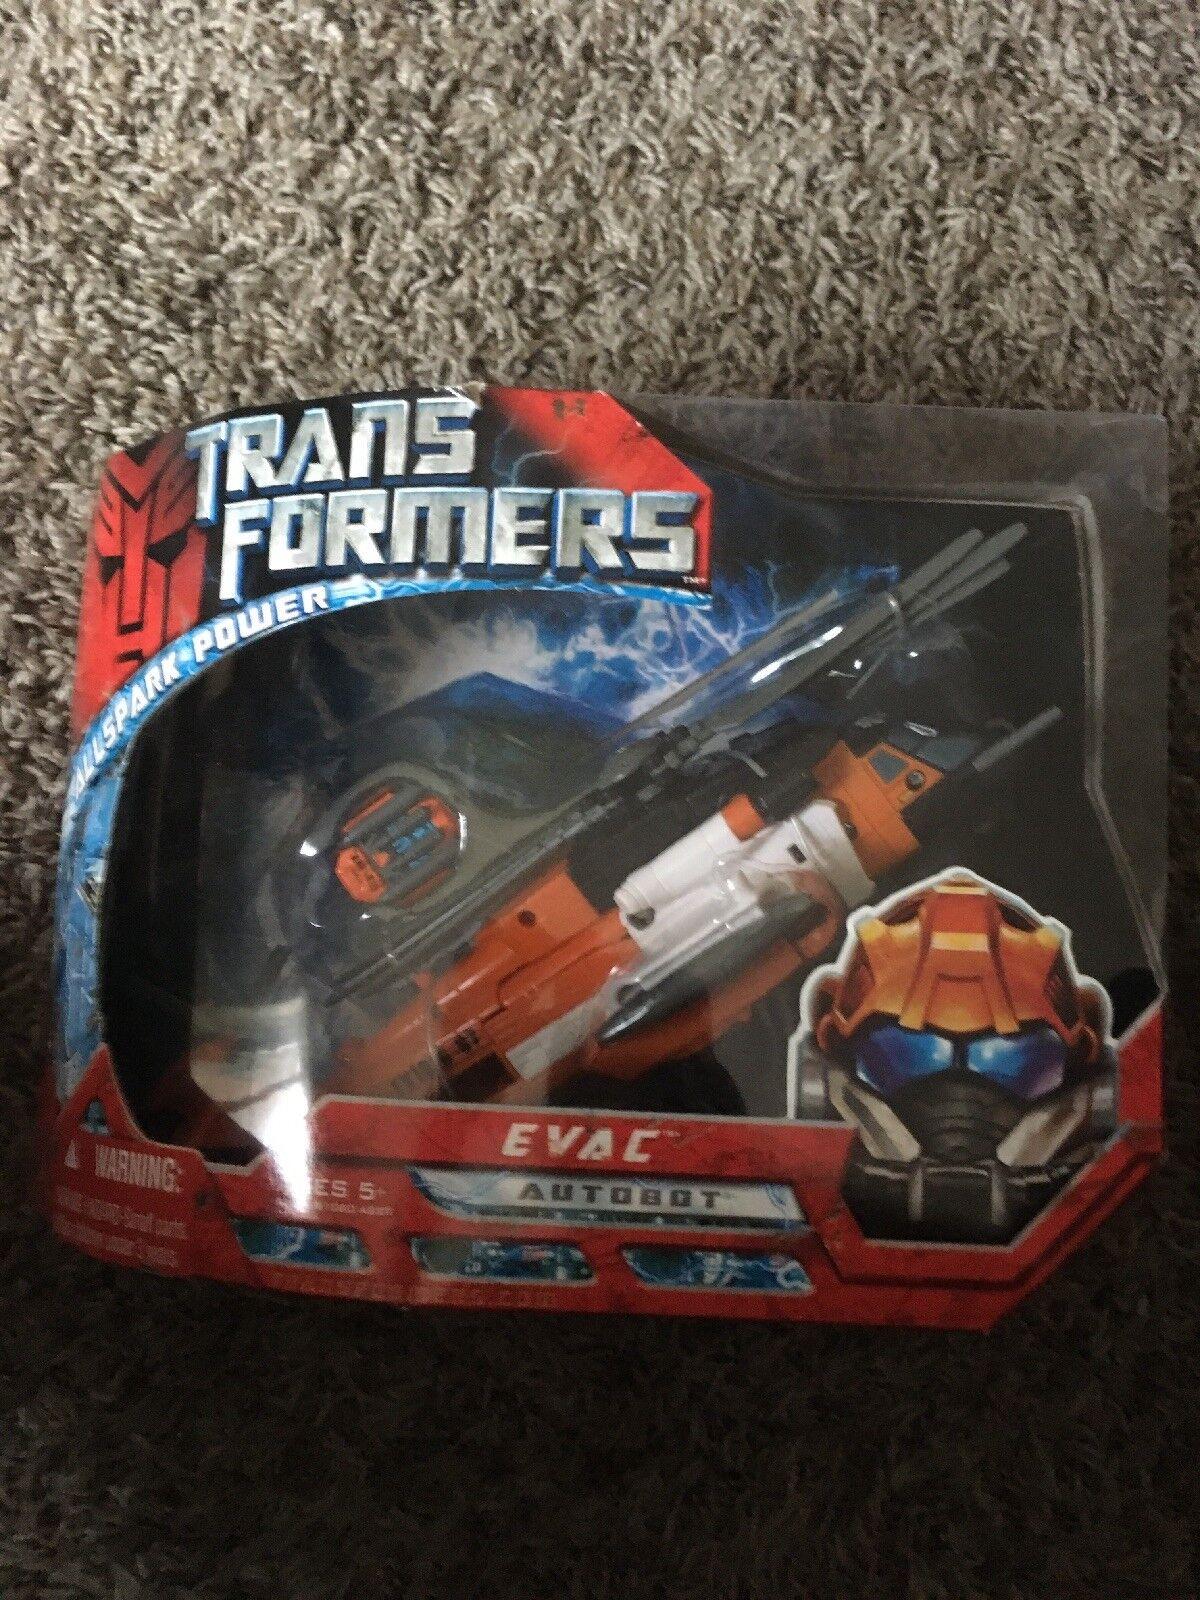 Hasbro Transformers Allspark Power Voyager - Evac Action Figure MISB 2007 Movie